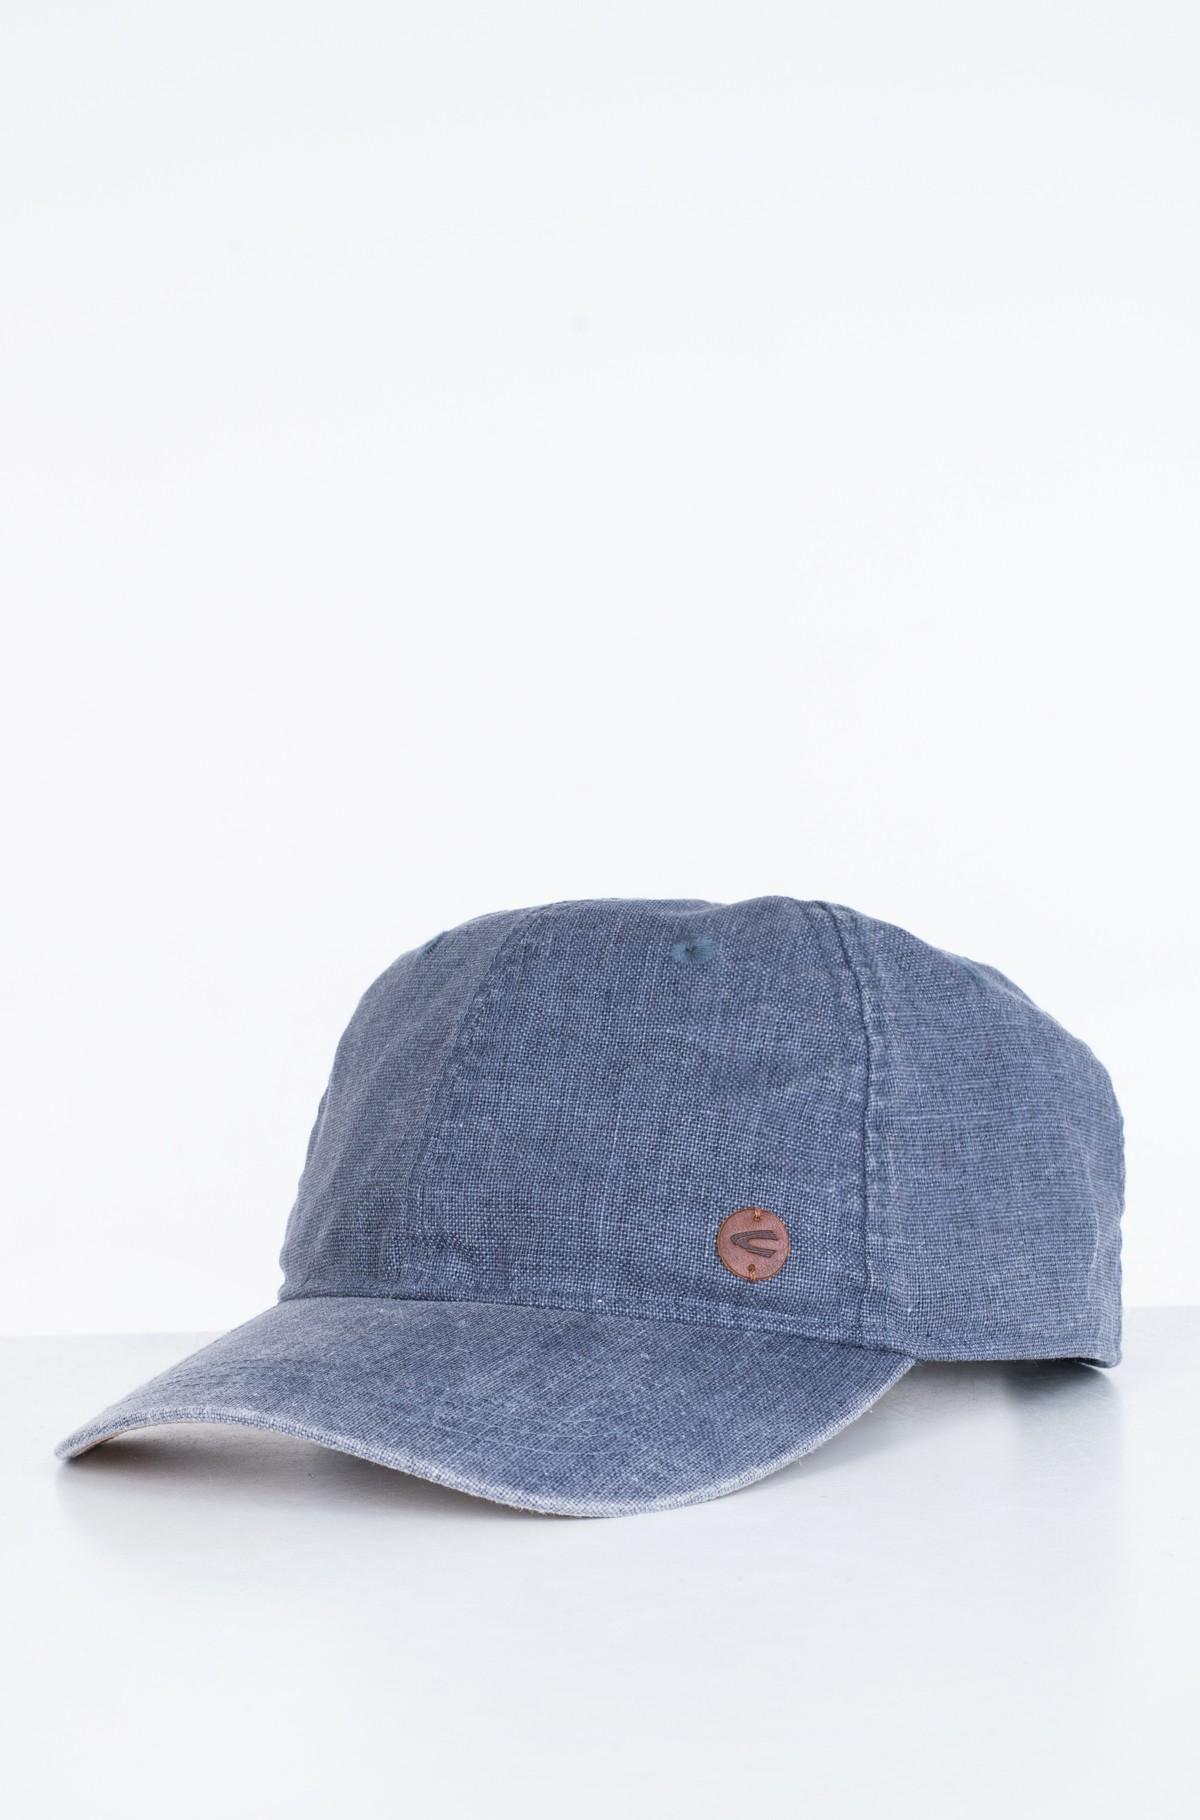 Kepurė su snapeliu  406310/3C31-full-1